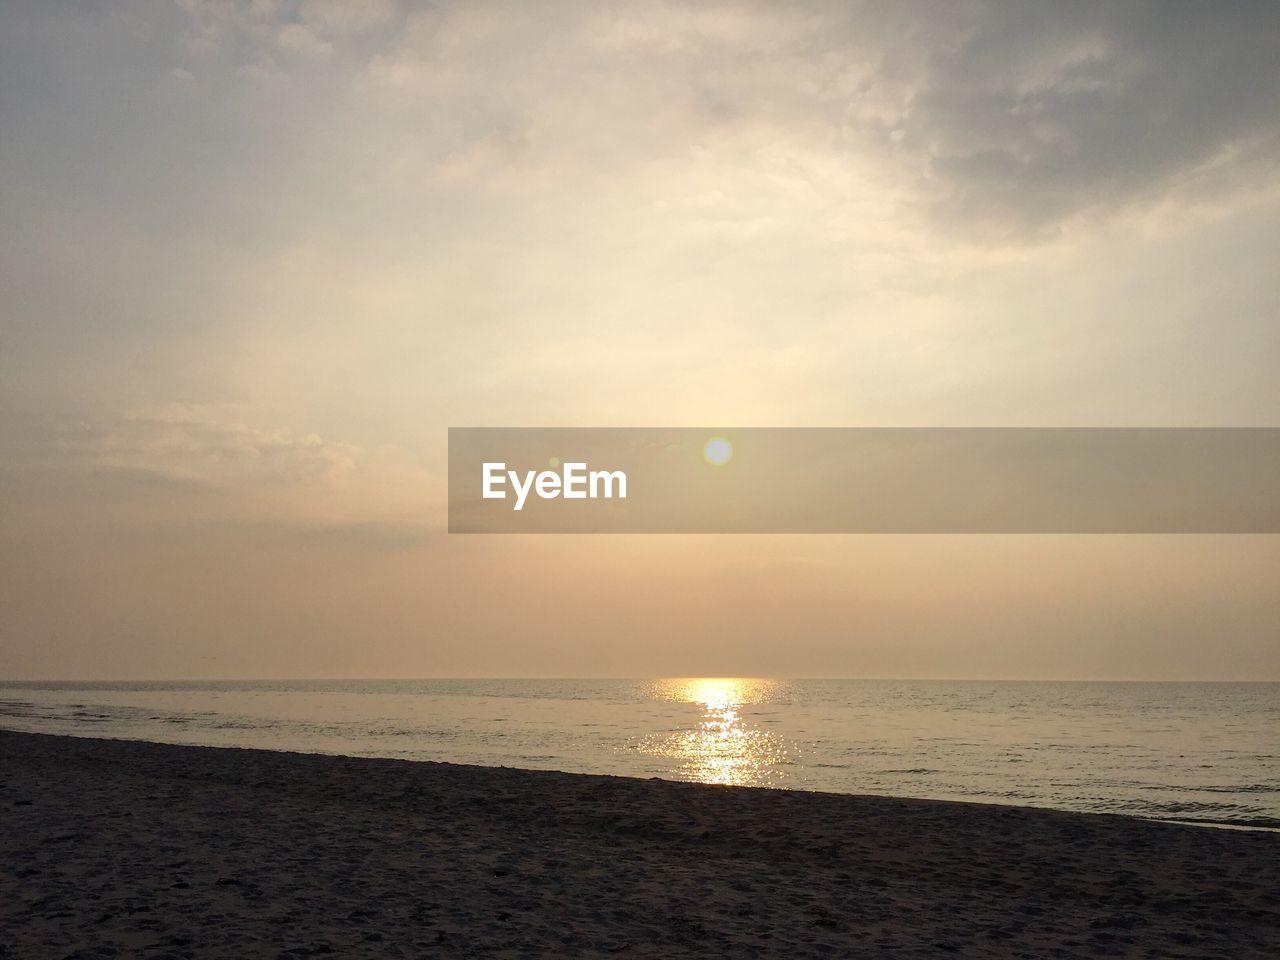 sky, sea, water, scenics - nature, horizon over water, horizon, beauty in nature, tranquility, tranquil scene, sun, sunset, beach, land, cloud - sky, nature, idyllic, sunlight, reflection, no people, outdoors